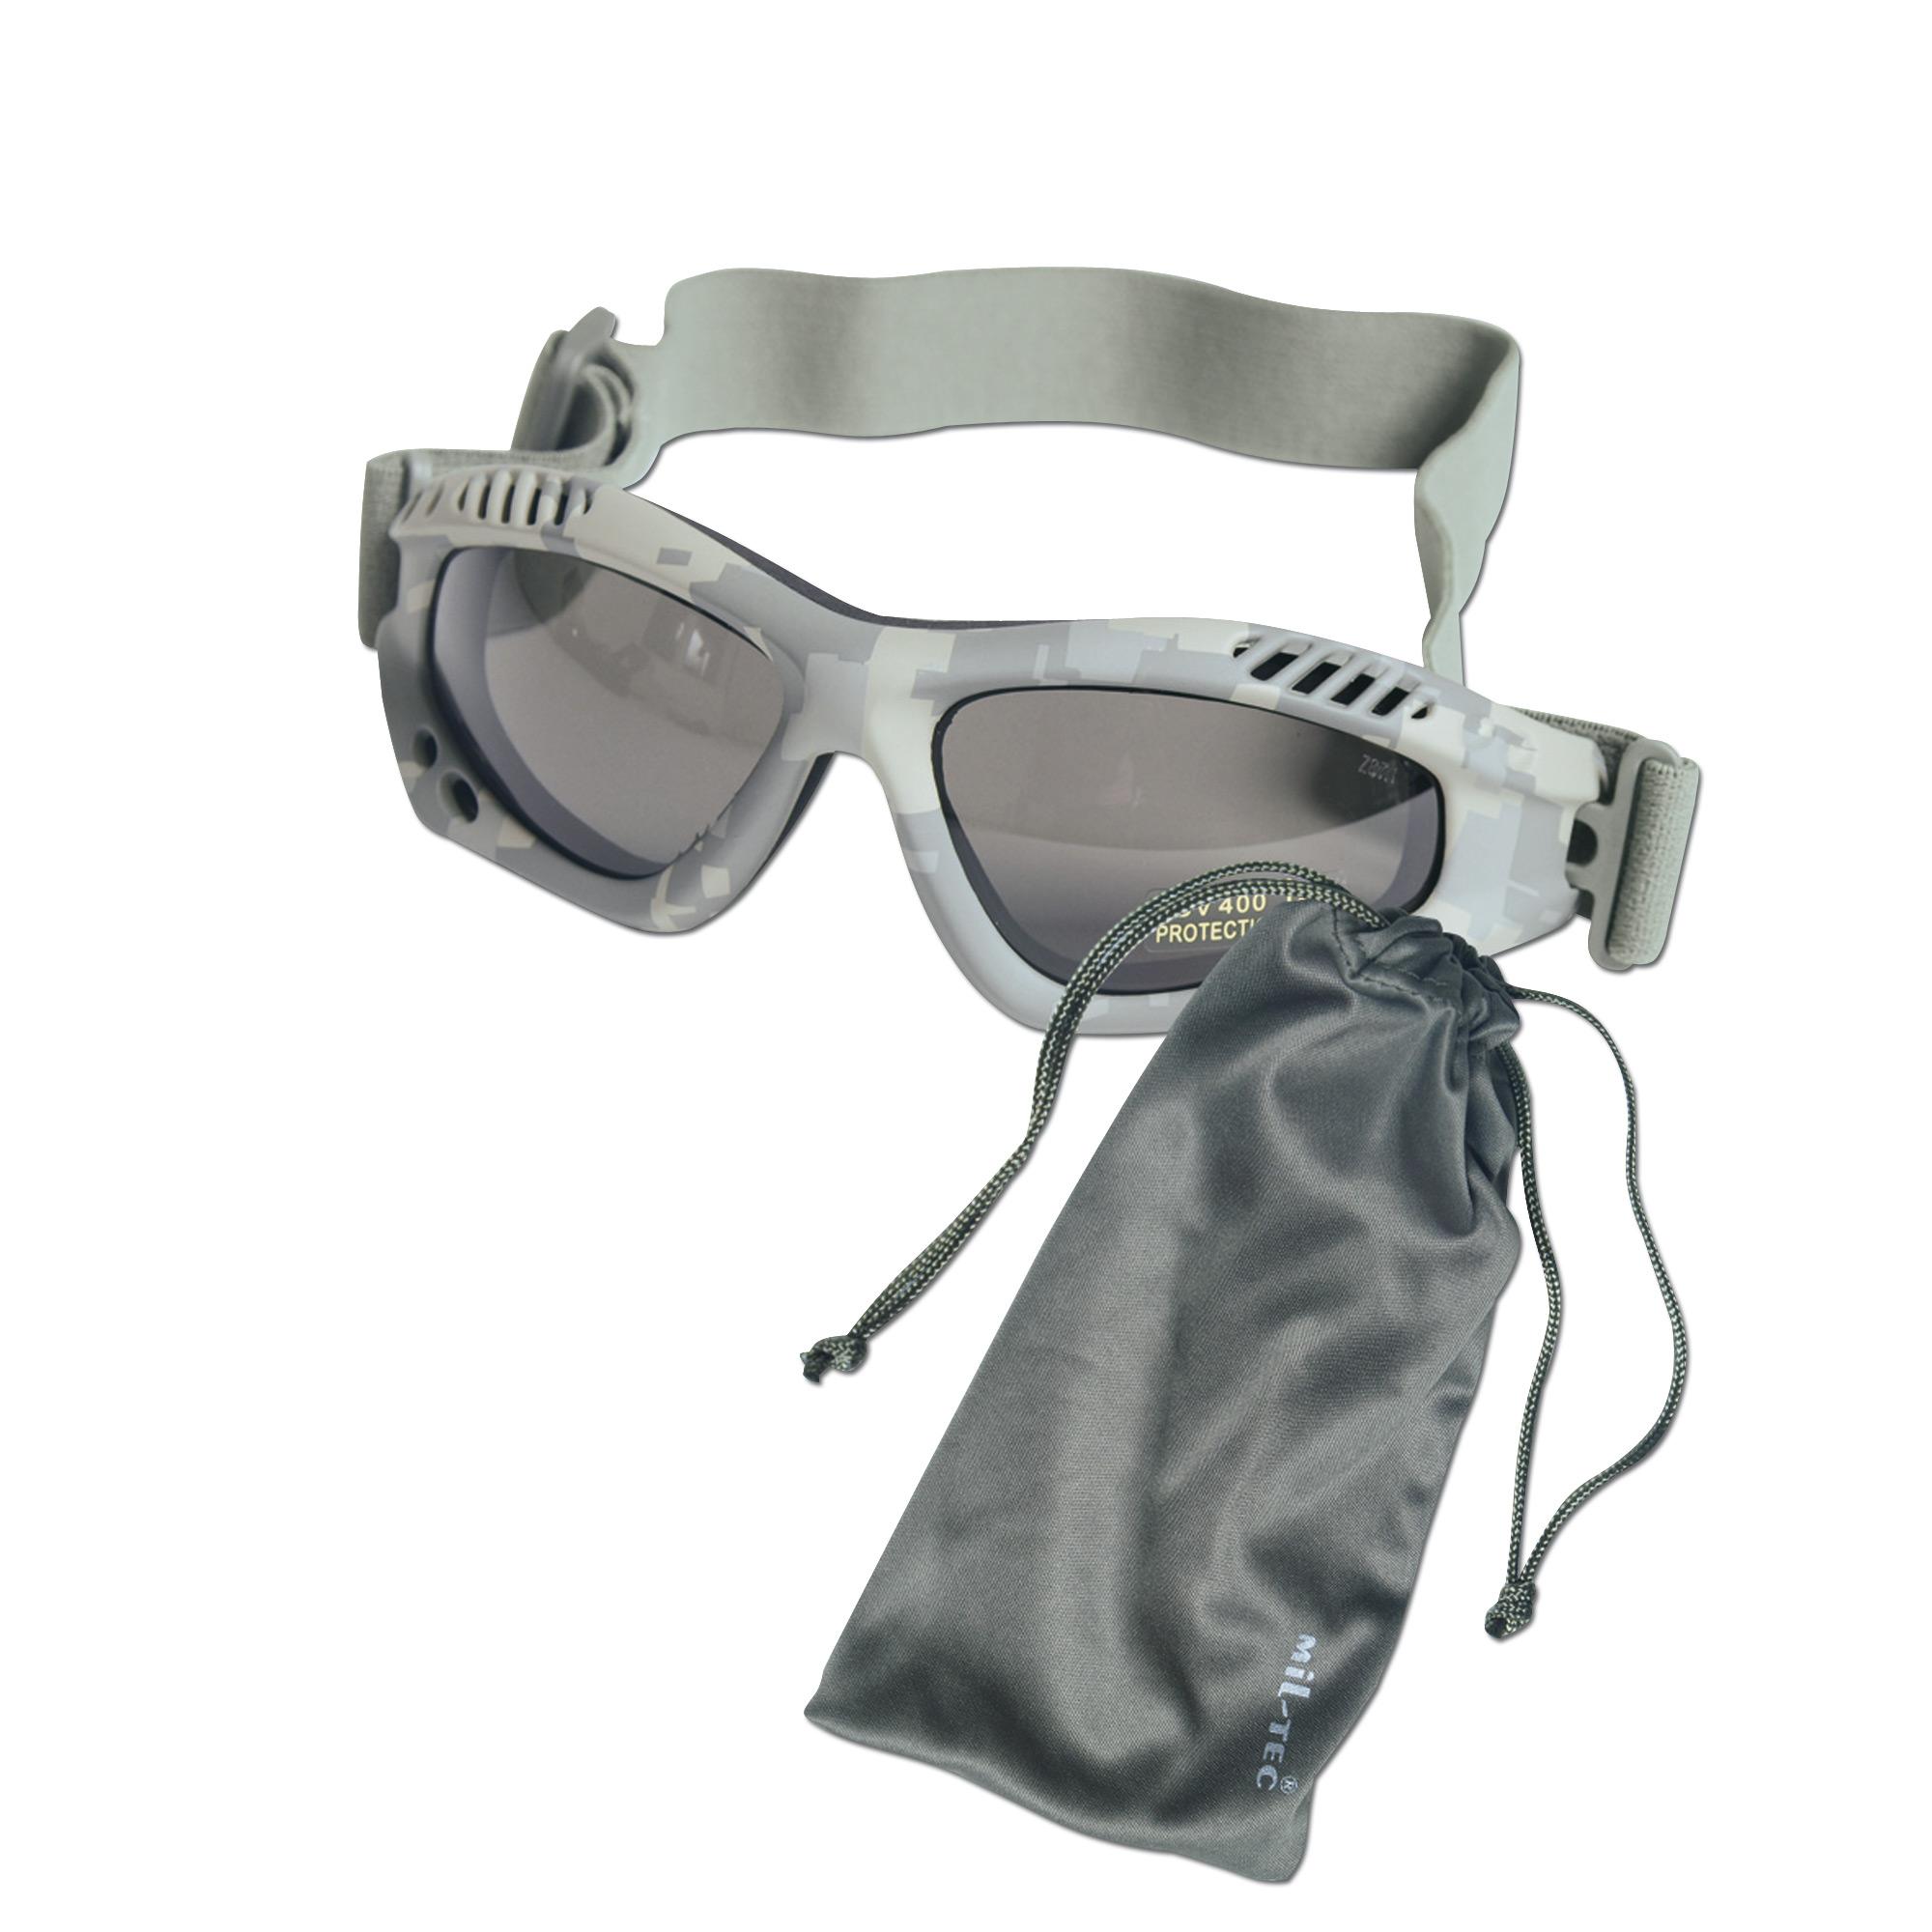 Gafas Commando Air-Pro AT-digital ahumadas